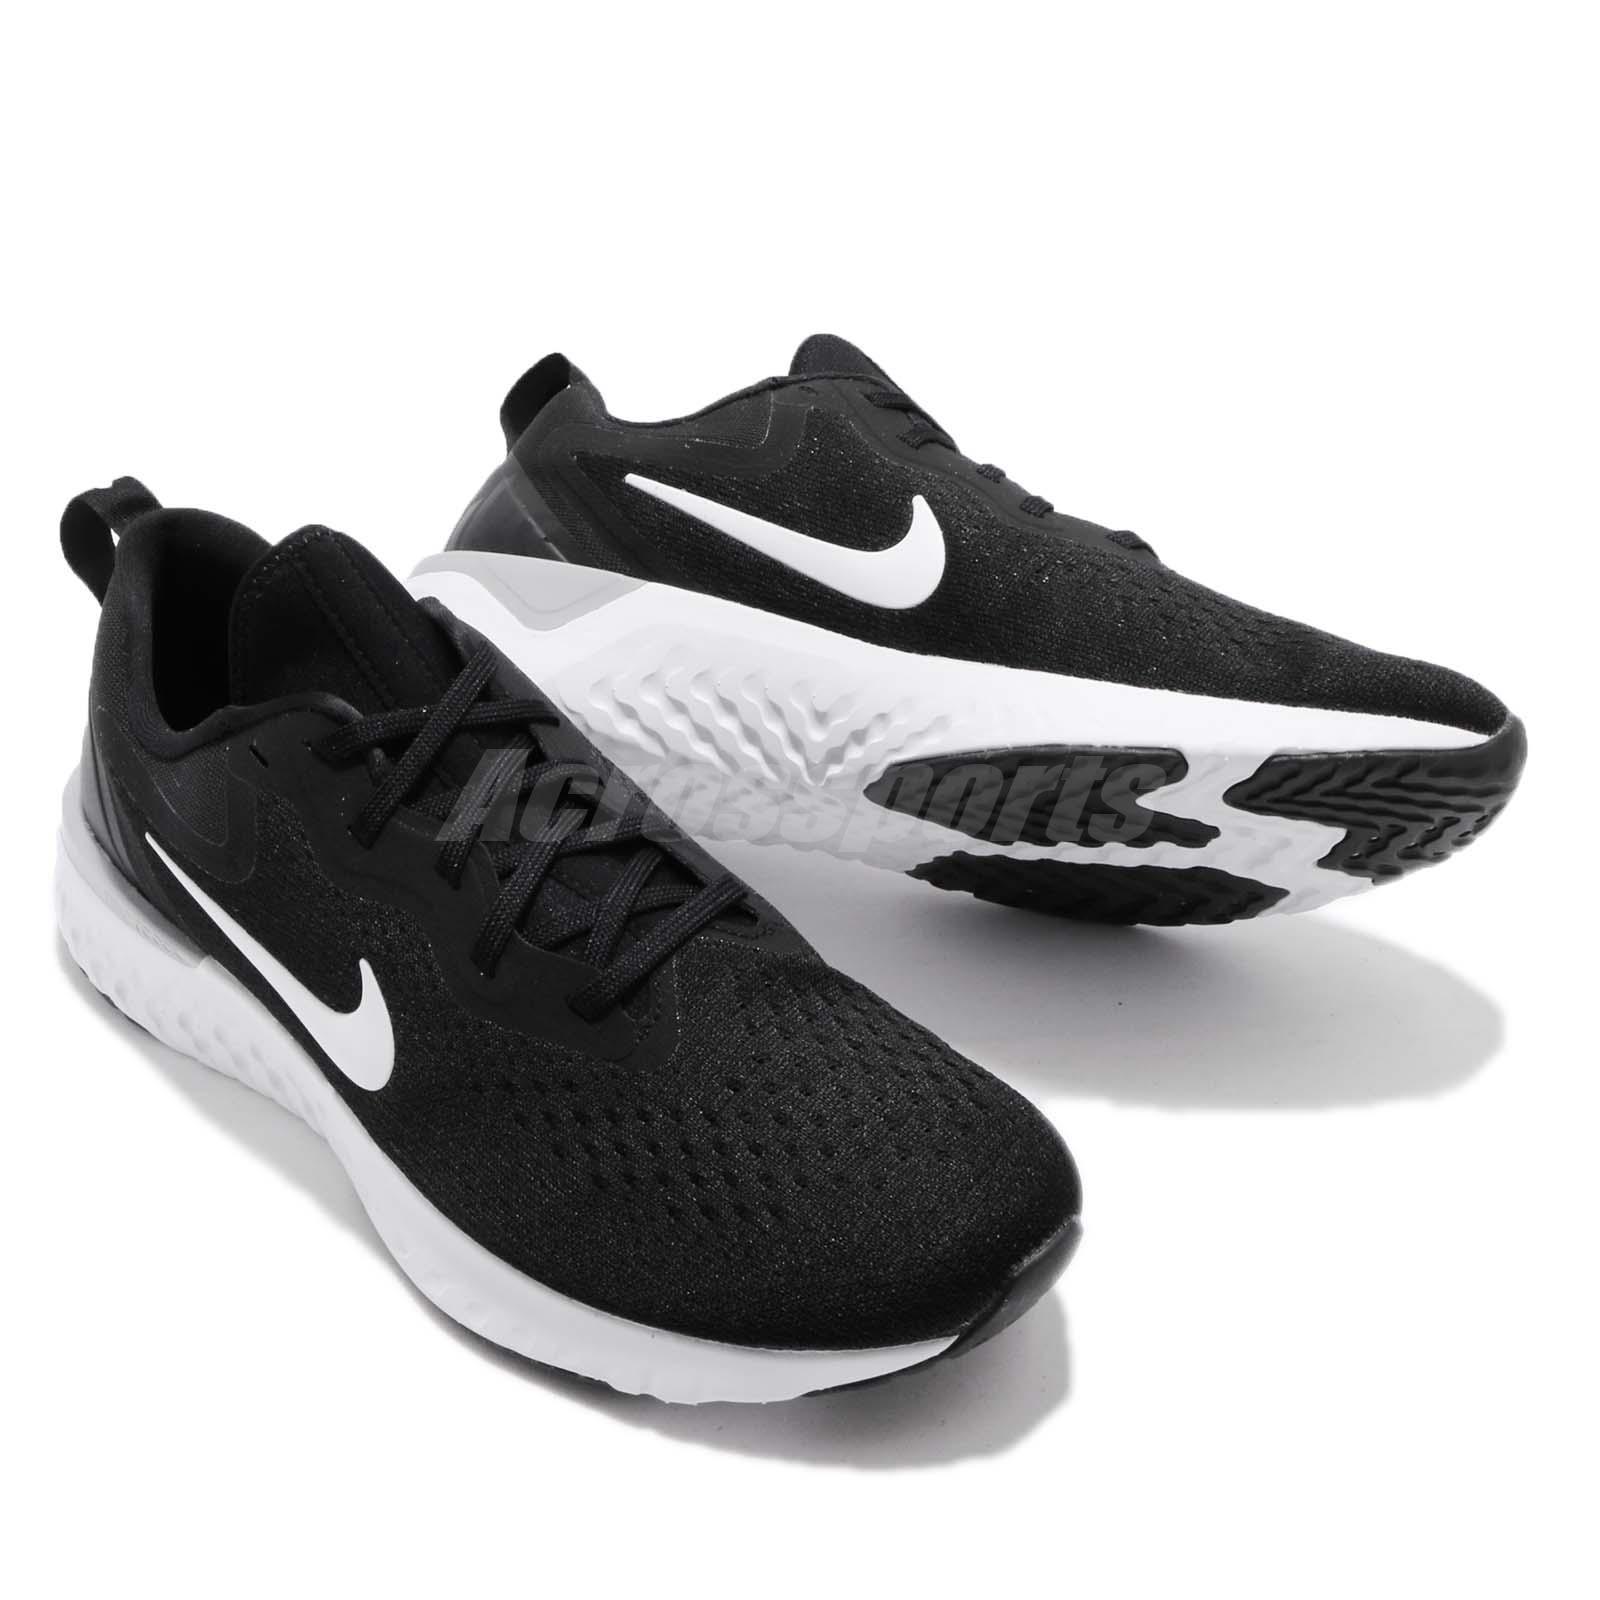 sneakers for cheap a8e88 4b6c3 Nike Odyssey React Black White Men Running Shoes Sneakers AO9819-001 ...